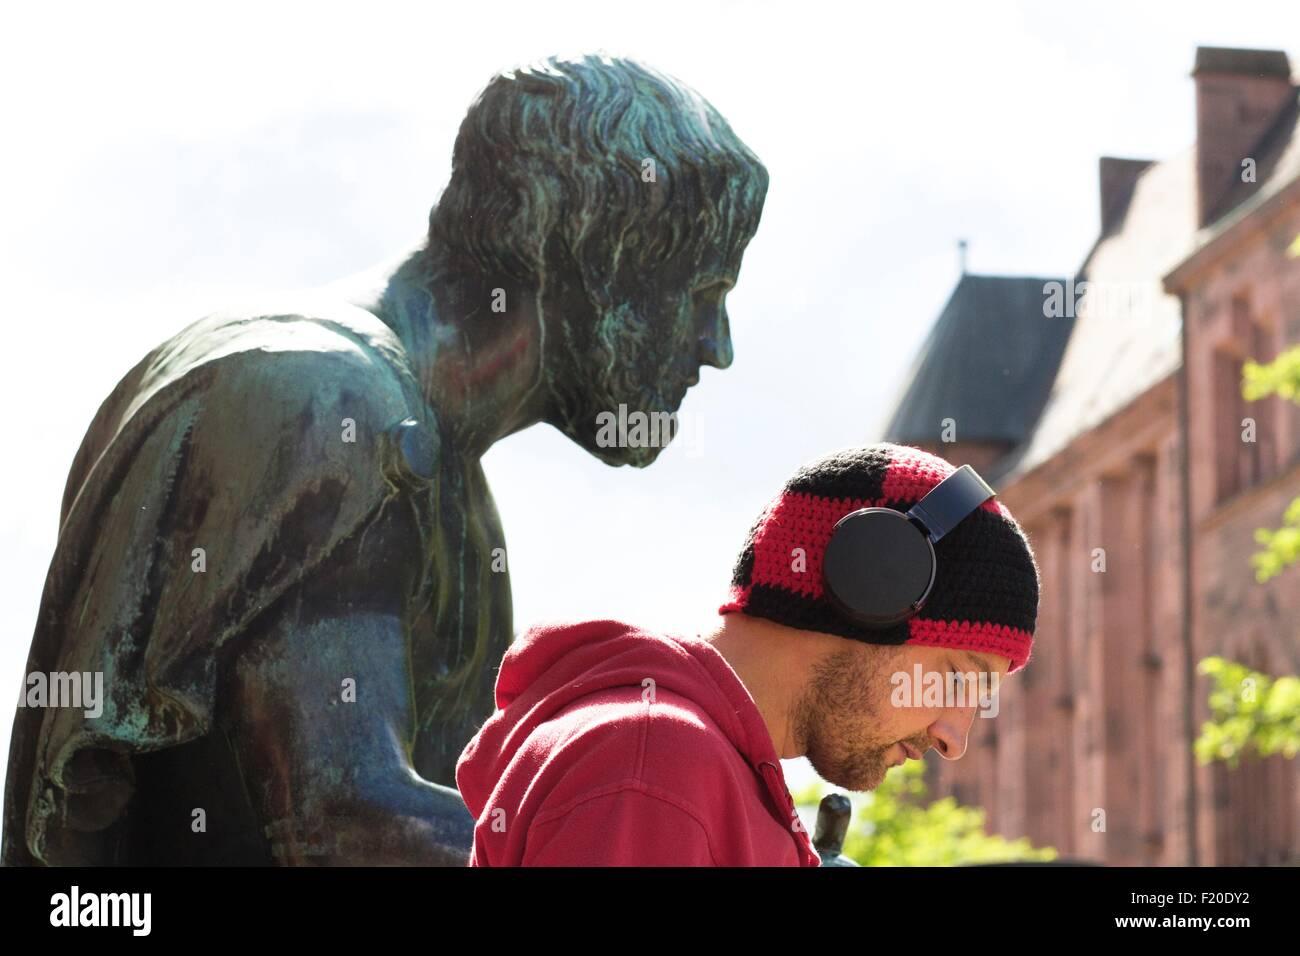 Head and shoulder portrait of mid adult man wearing headphones in front of sculpture, Freiburg, Baden, Germany - Stock Image